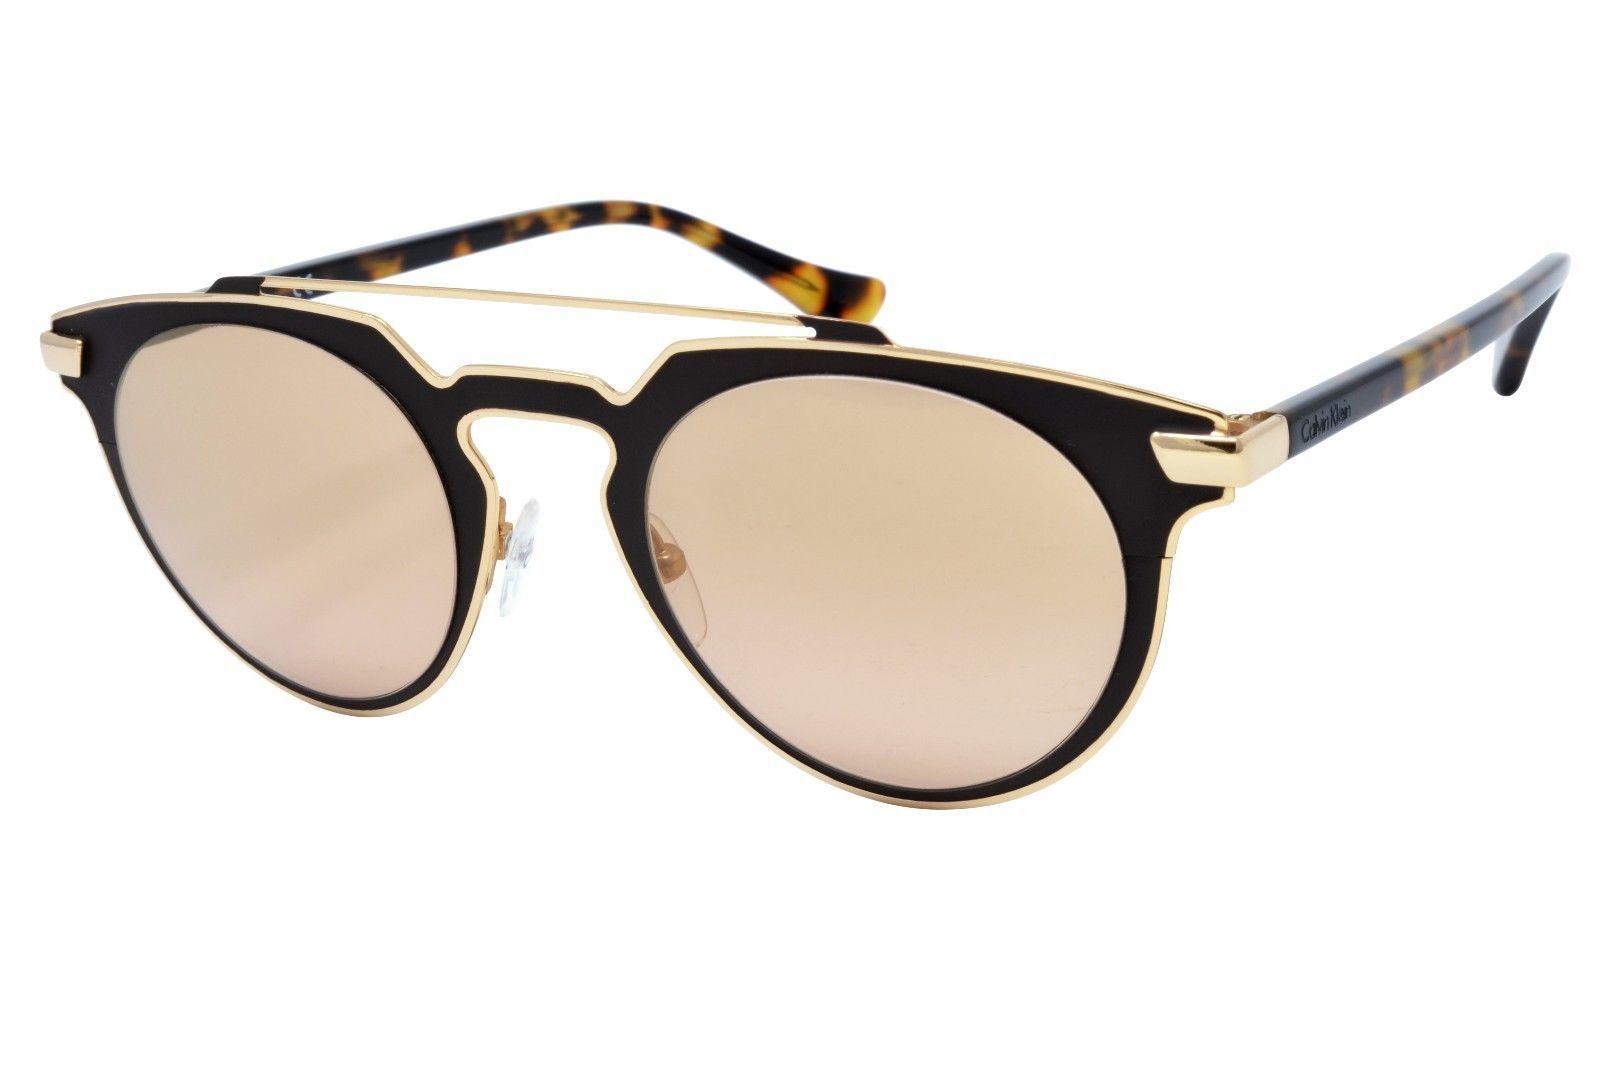 419b7672012 NEW Calvin Klein Women s Ck2147s 210 Round Sunglasses